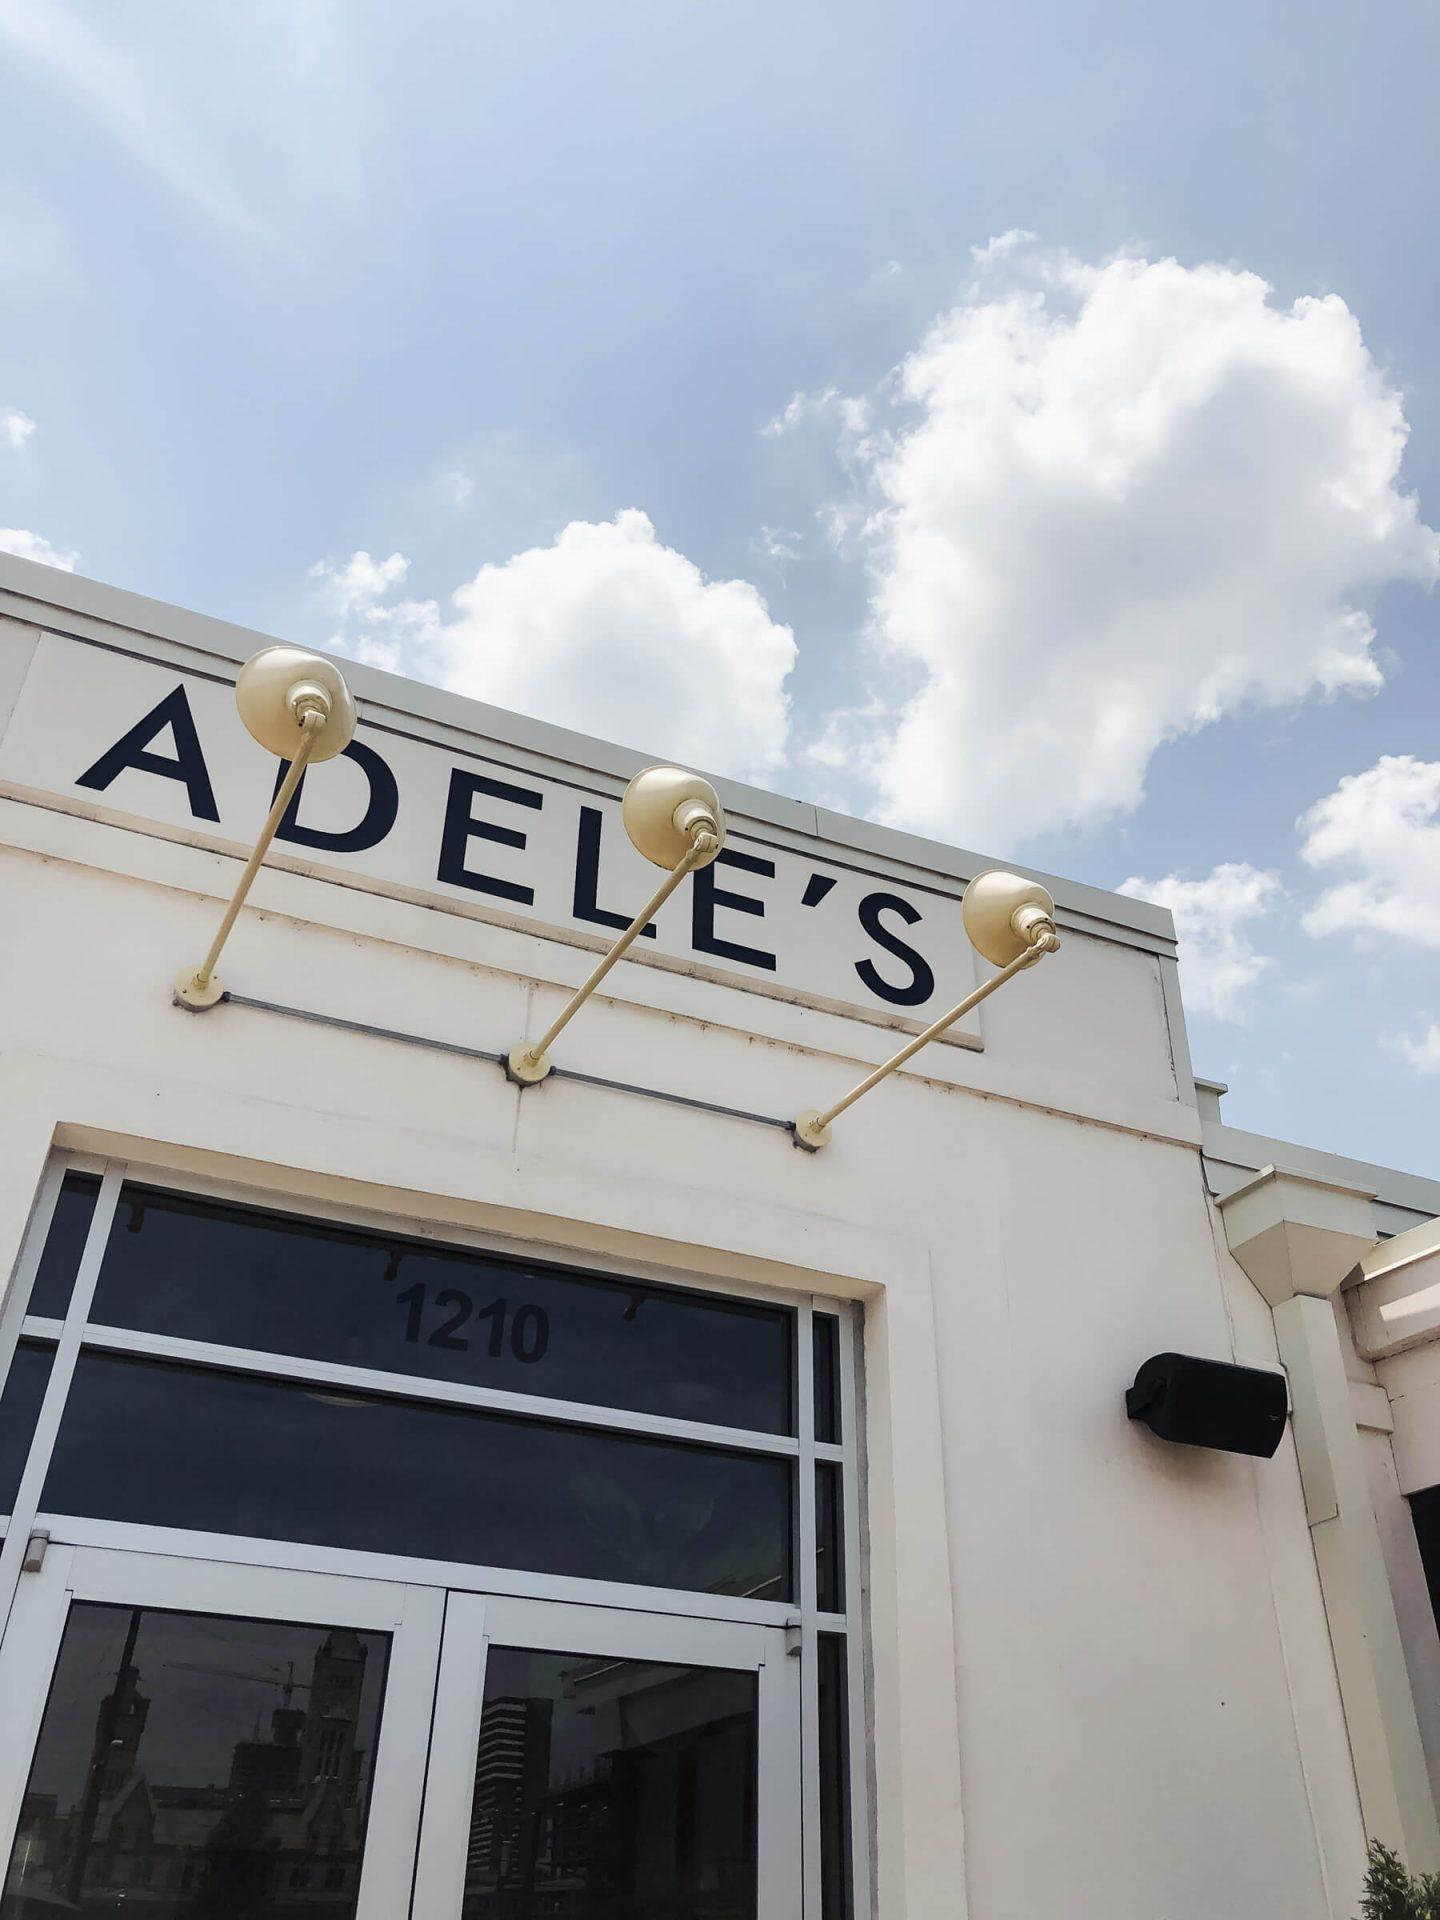 Sababok Nashville Adeles 1440x1920